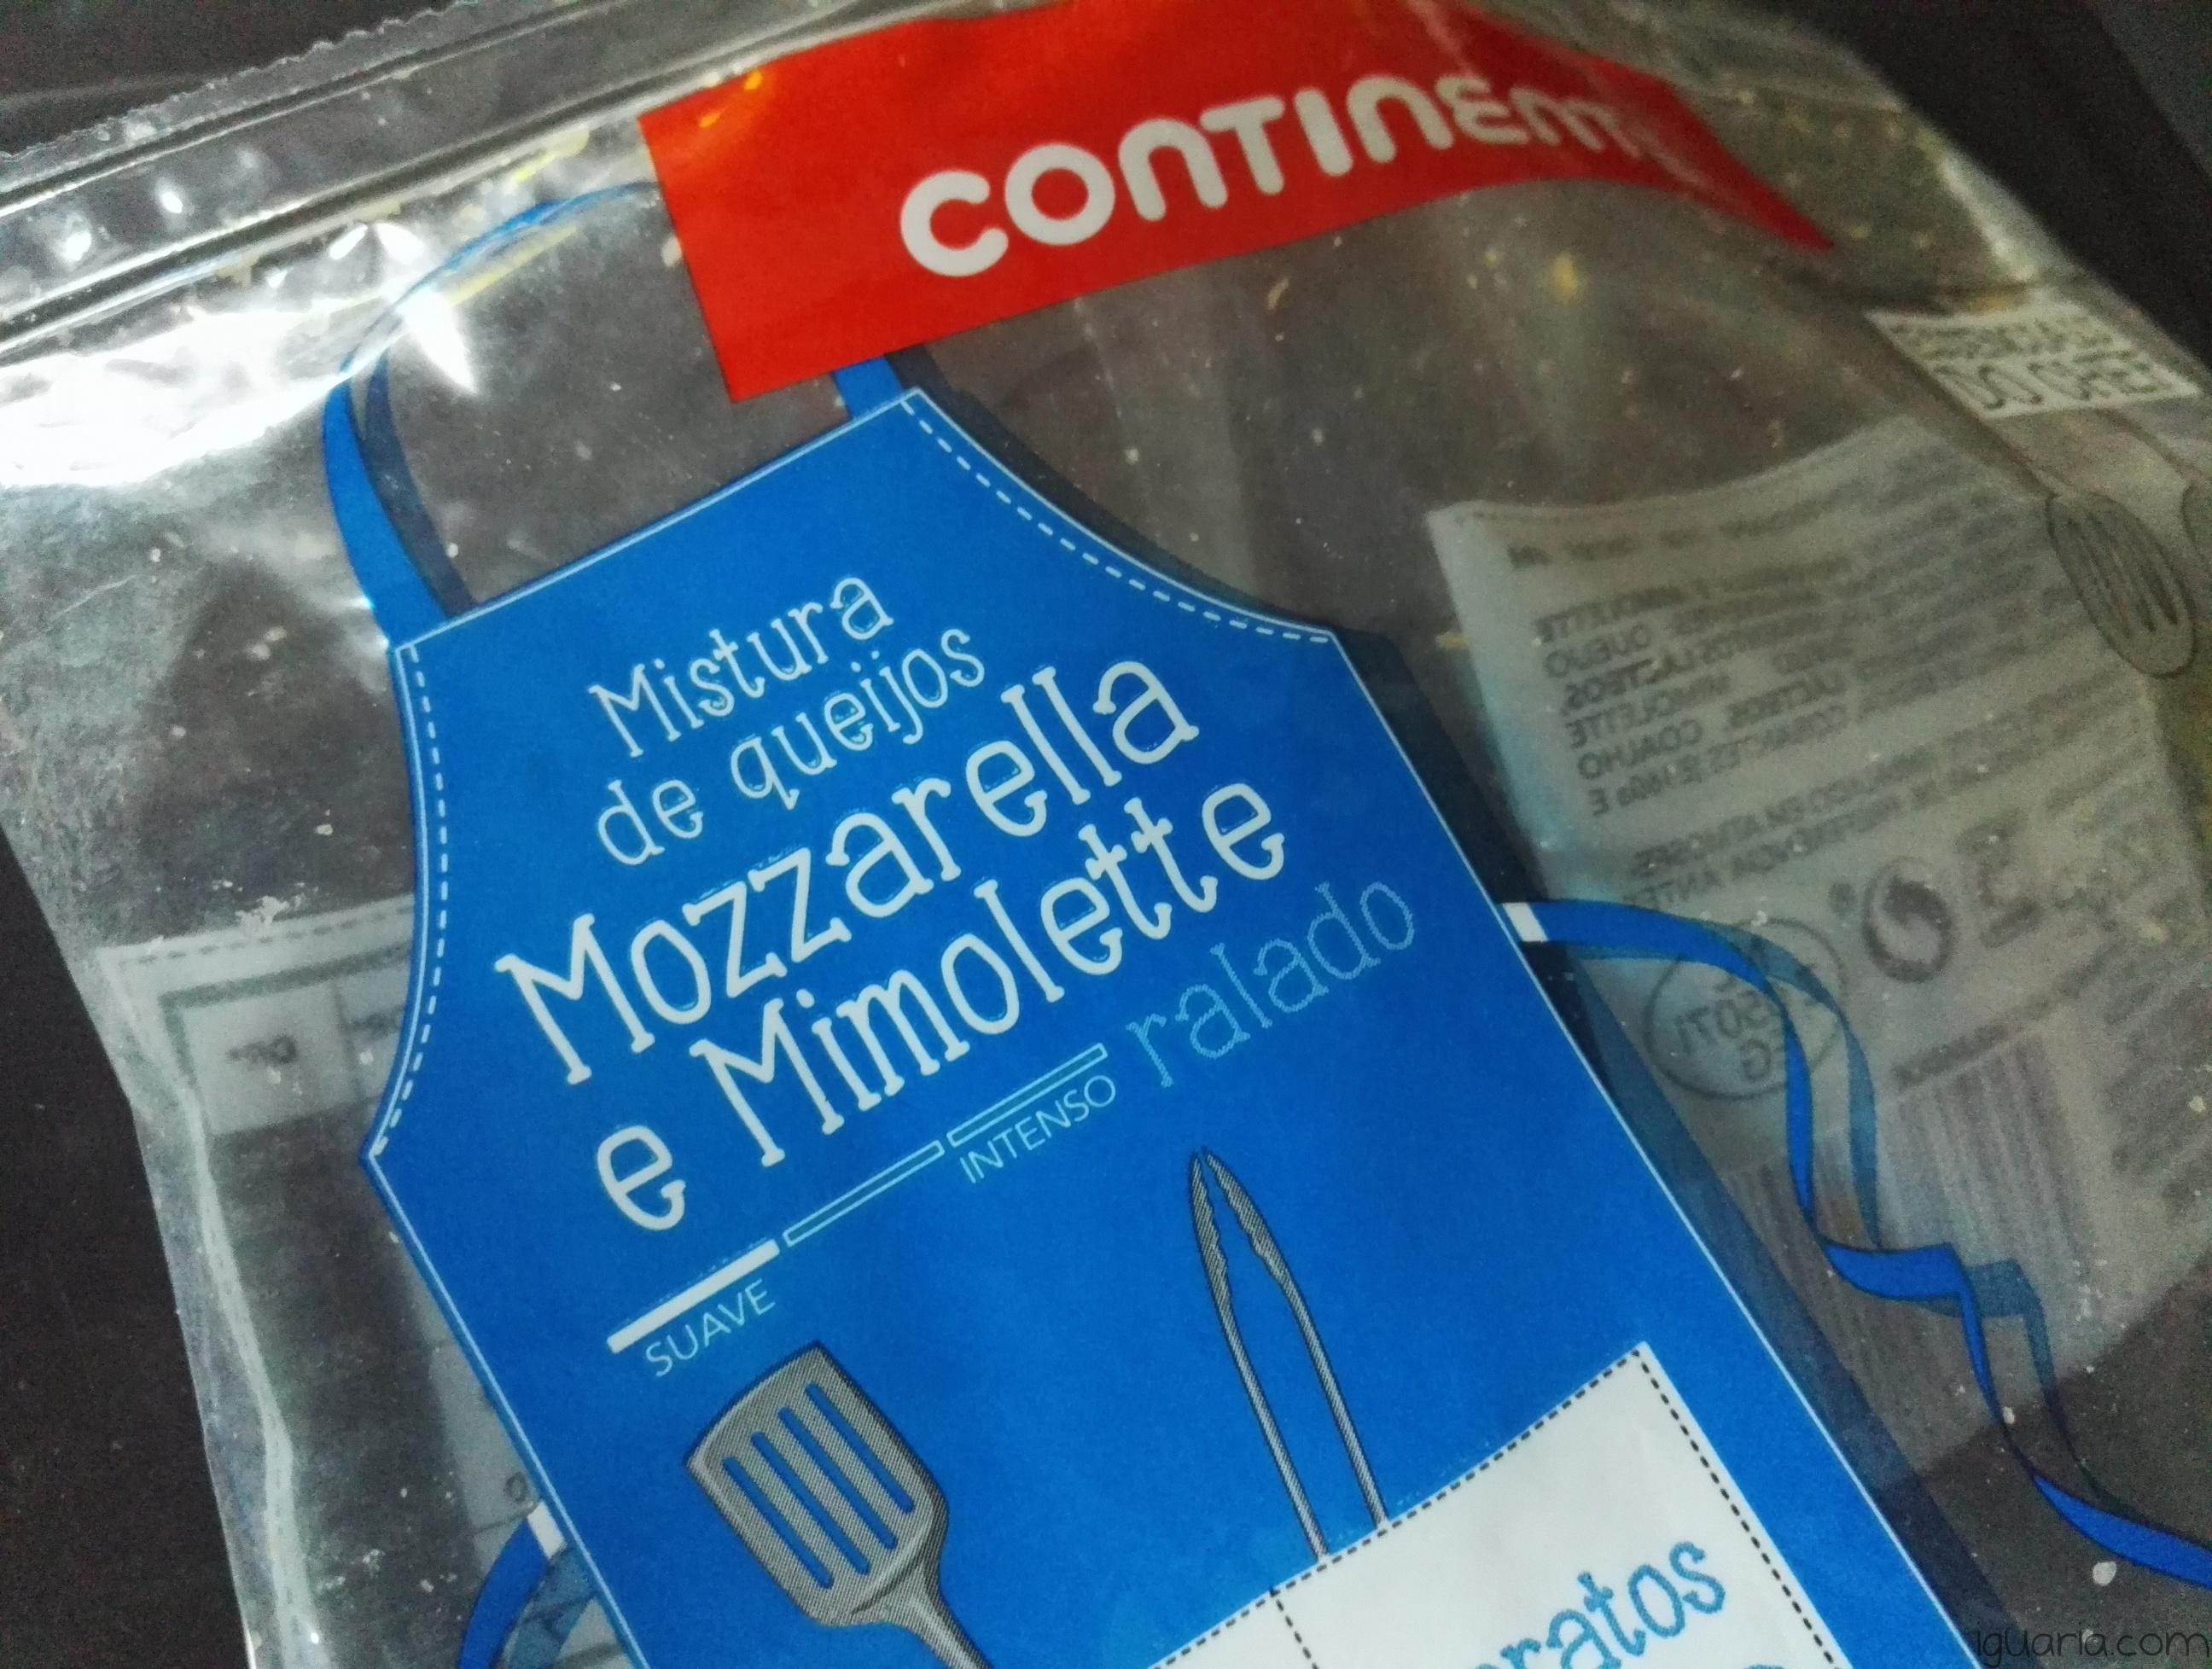 Iguaria_Mistura-de-Queijos-Mozzarela-e-Mimolette